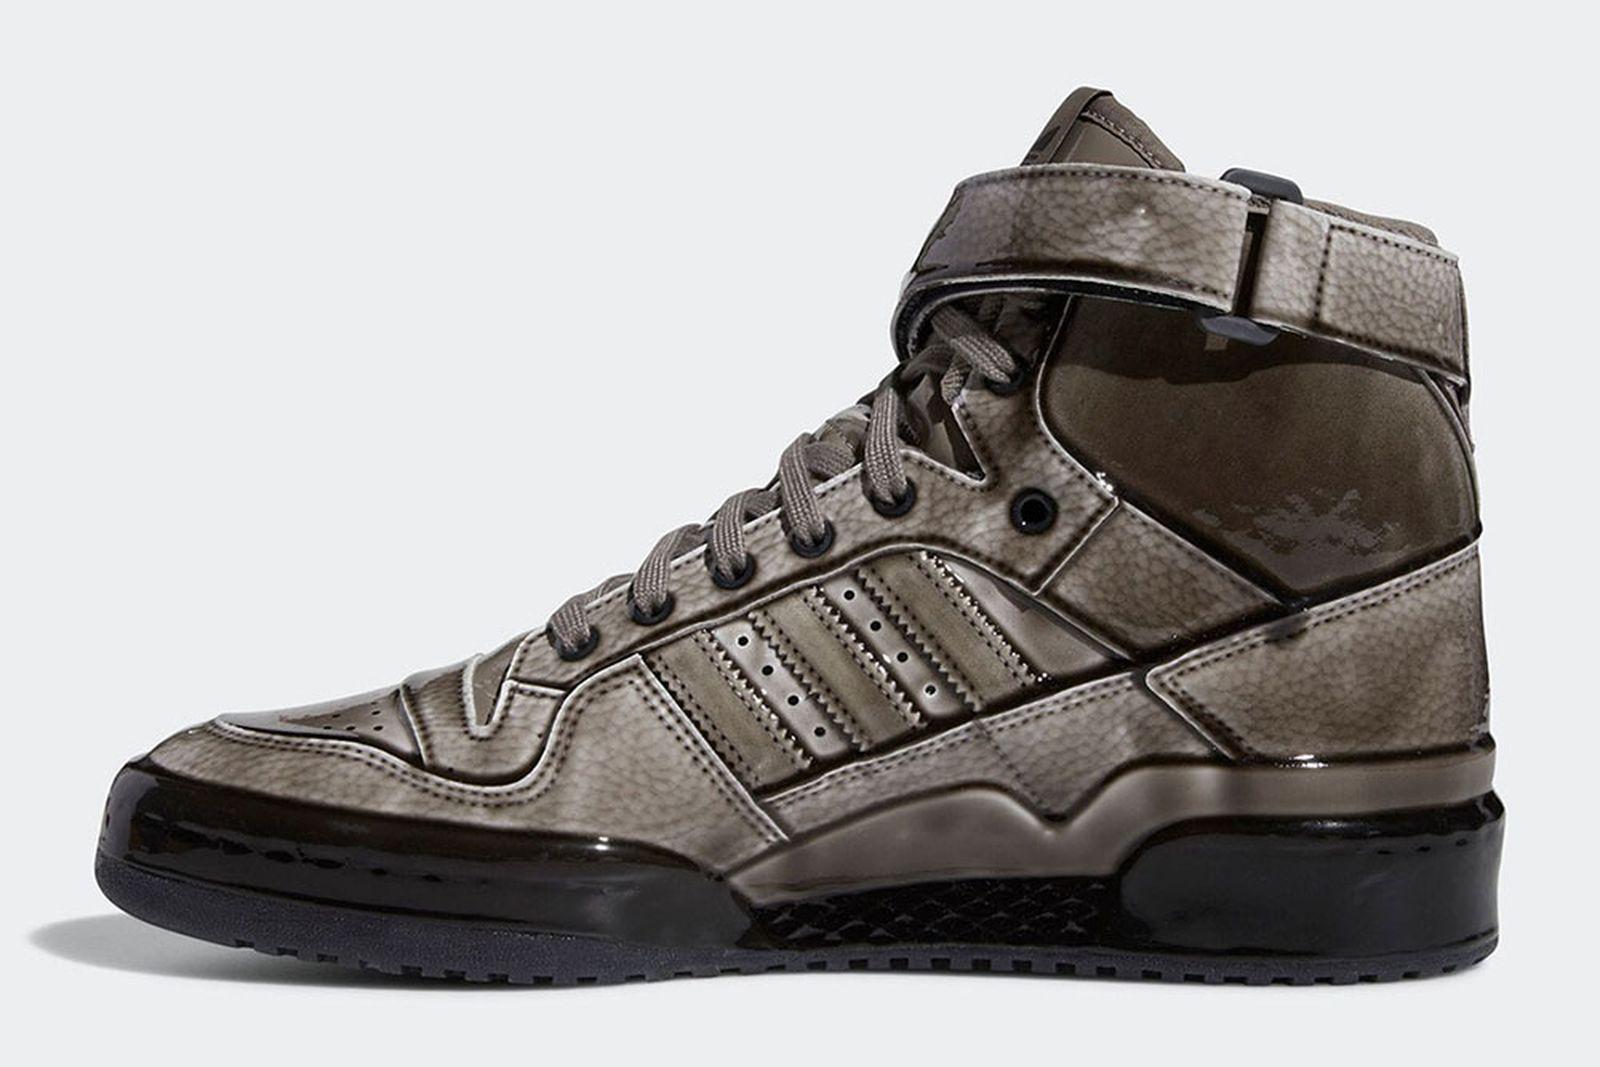 jeremy-scott-adidas-forum-hi-release-date-price-08